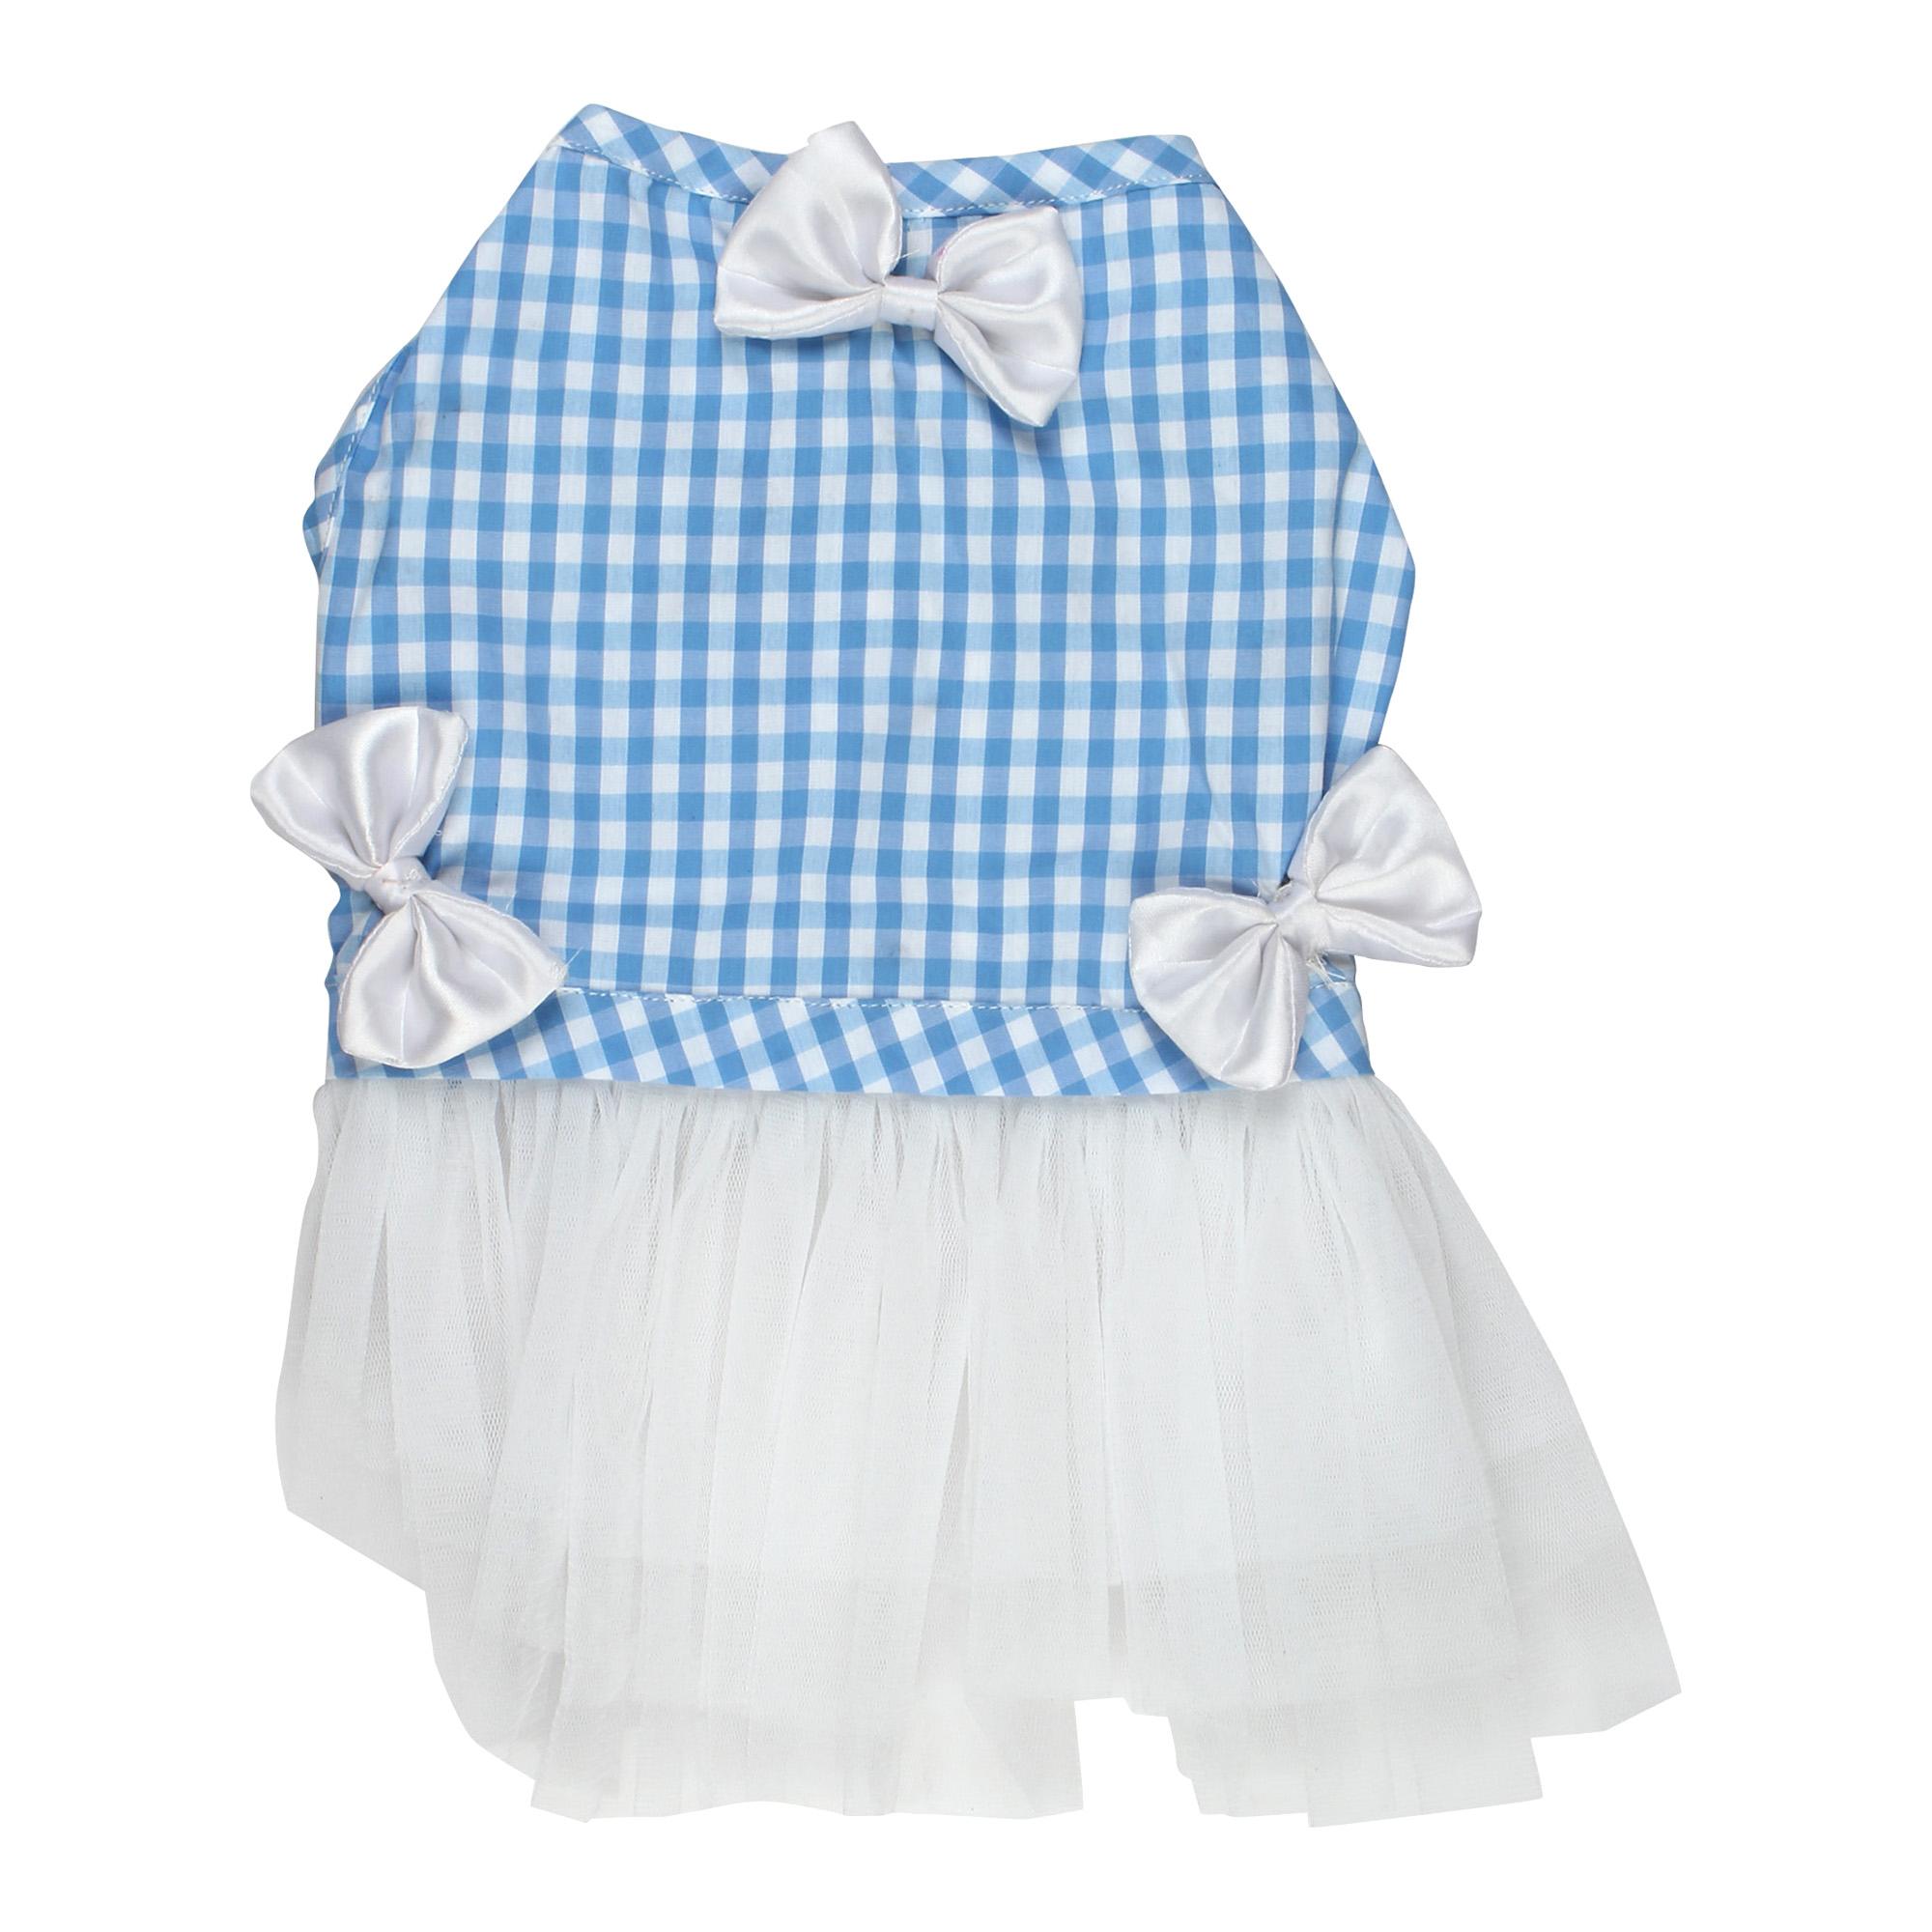 Douge Coutre blue check ultra cute dog/cat dress